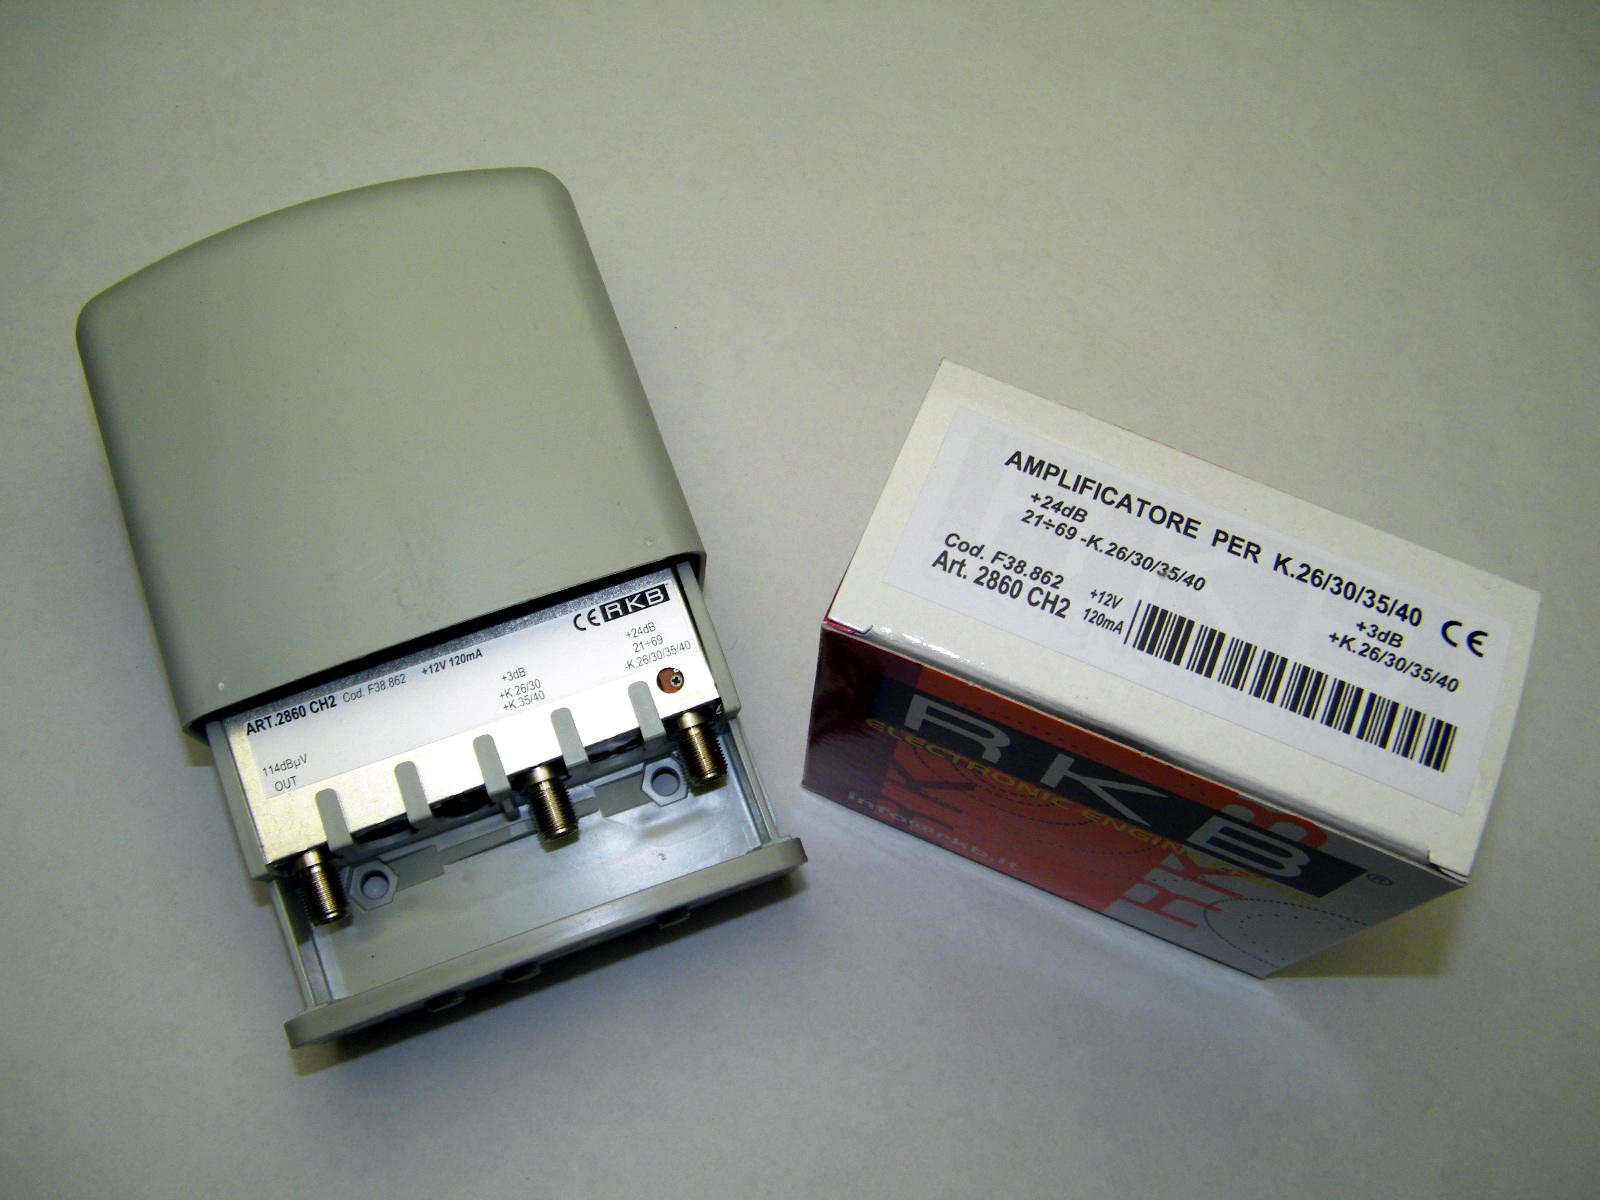 Amplificatore x 4 Mux Rai 26,30,35,40 24dB UHF-K/K 3dB 115dBuV 120mA 2860CH2